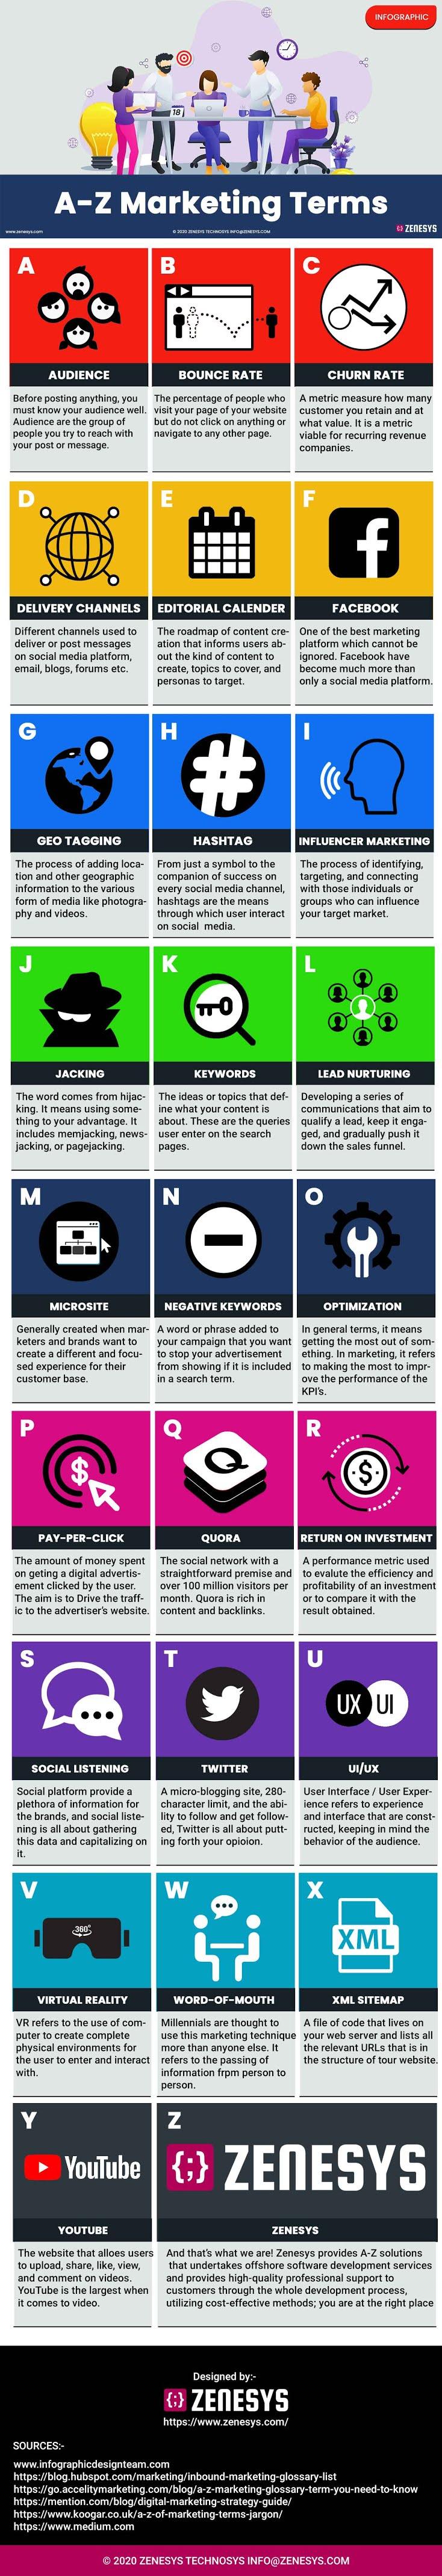 A-Z Marketing Terms